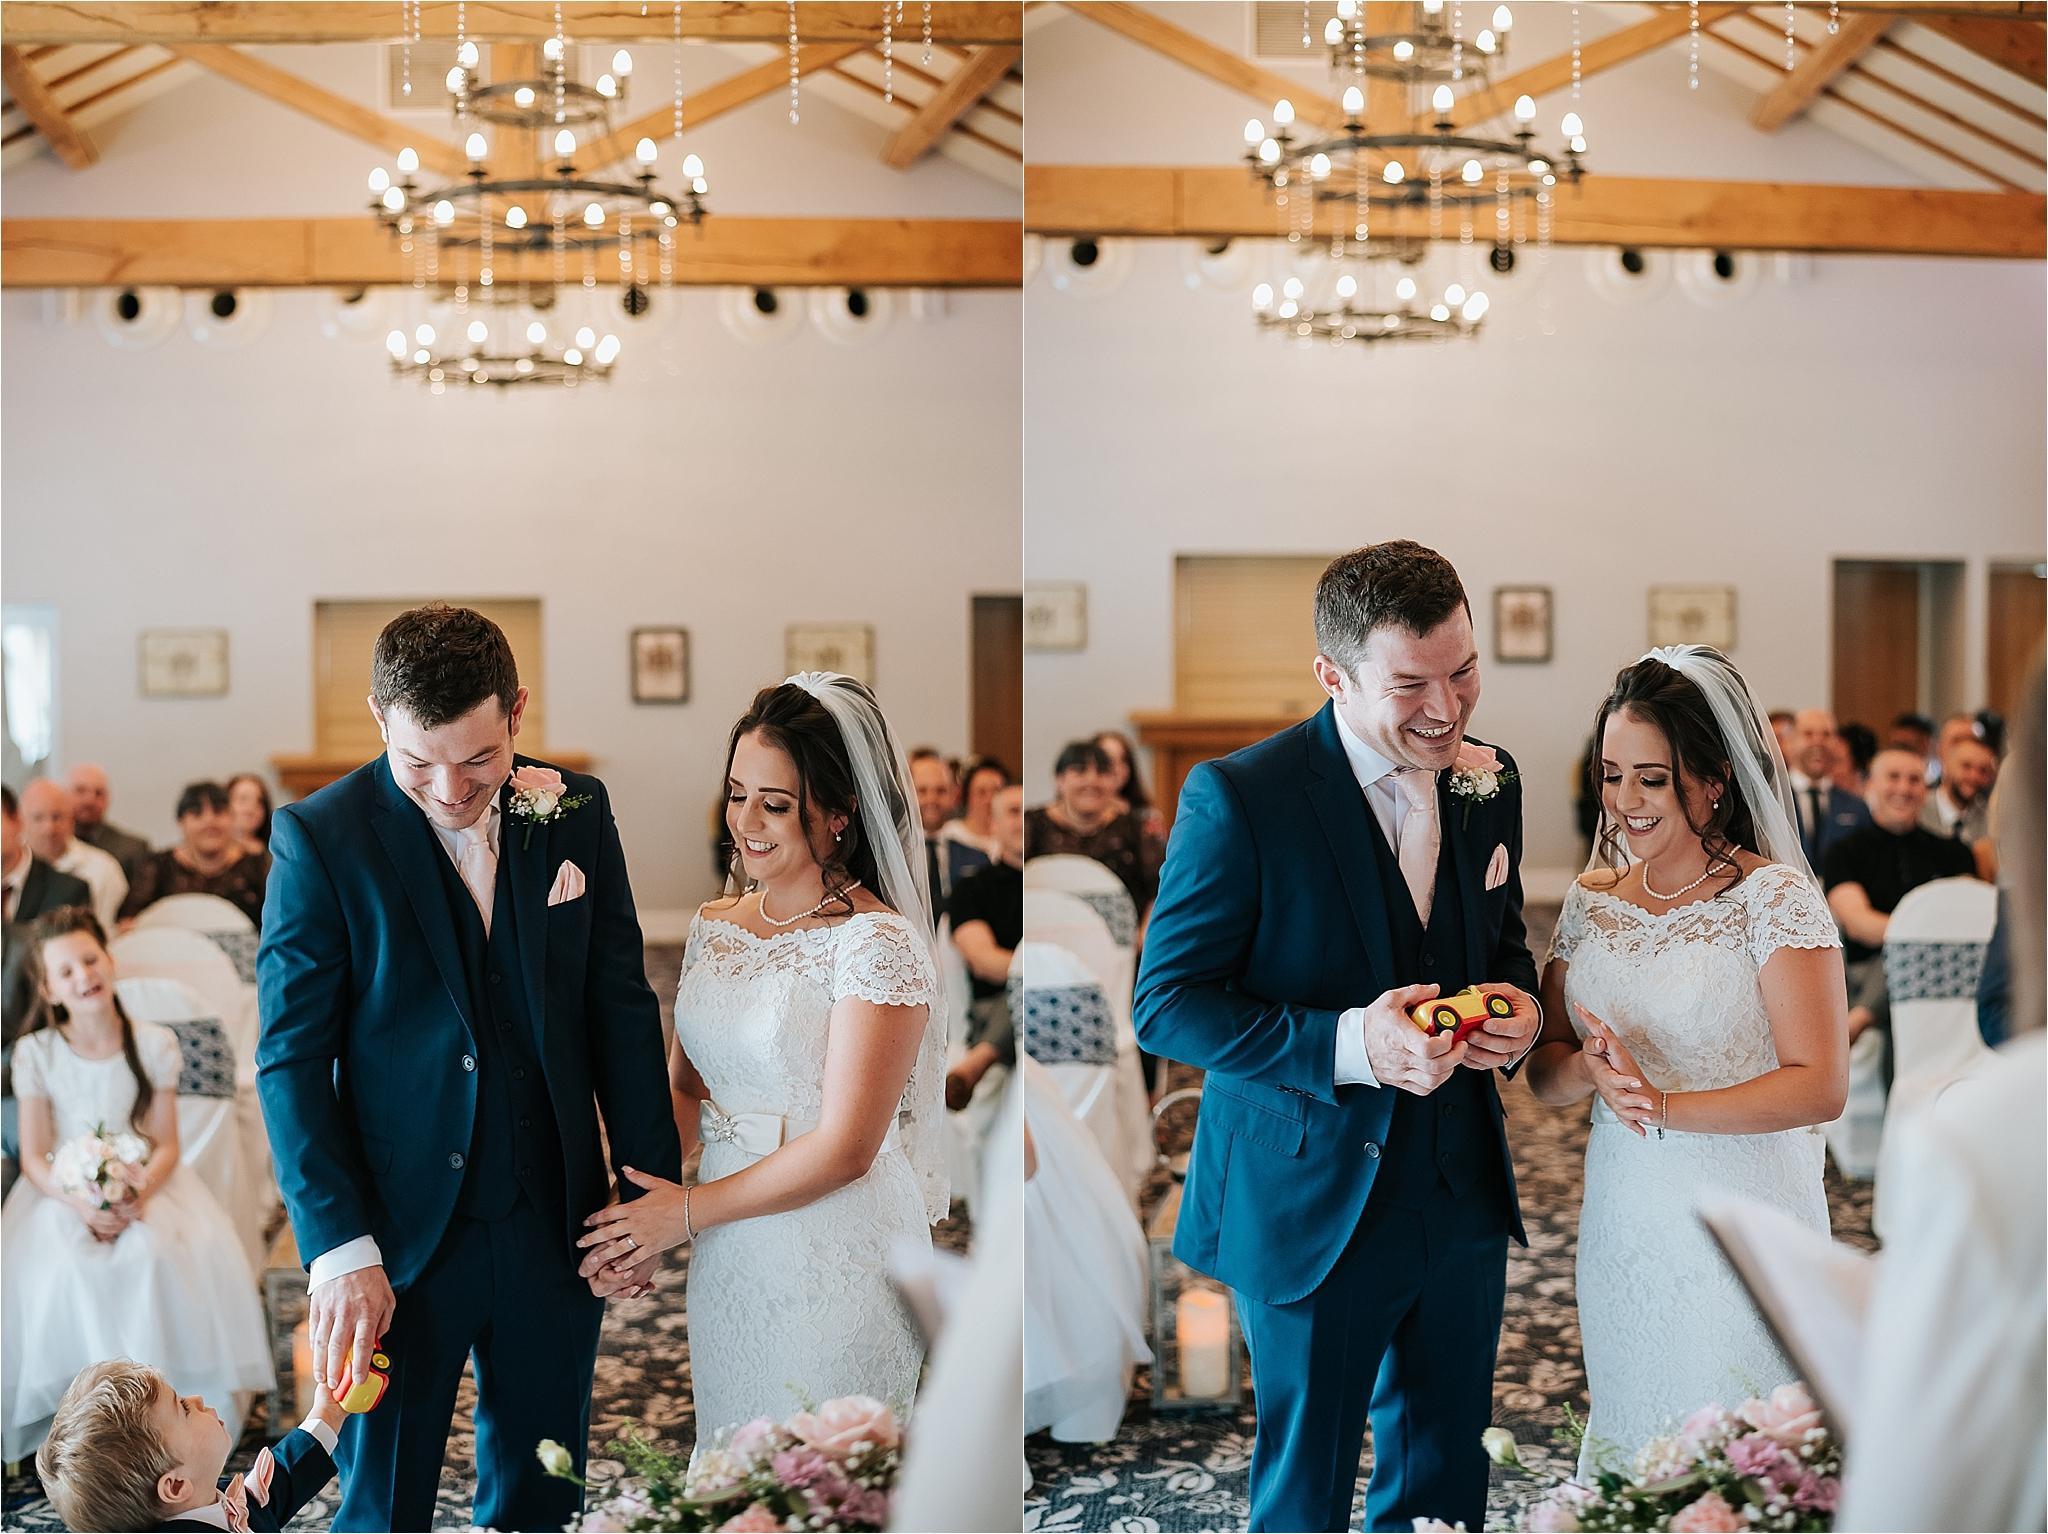 thevilla+lancashire+wreagreen+wedding+photographer30.jpg